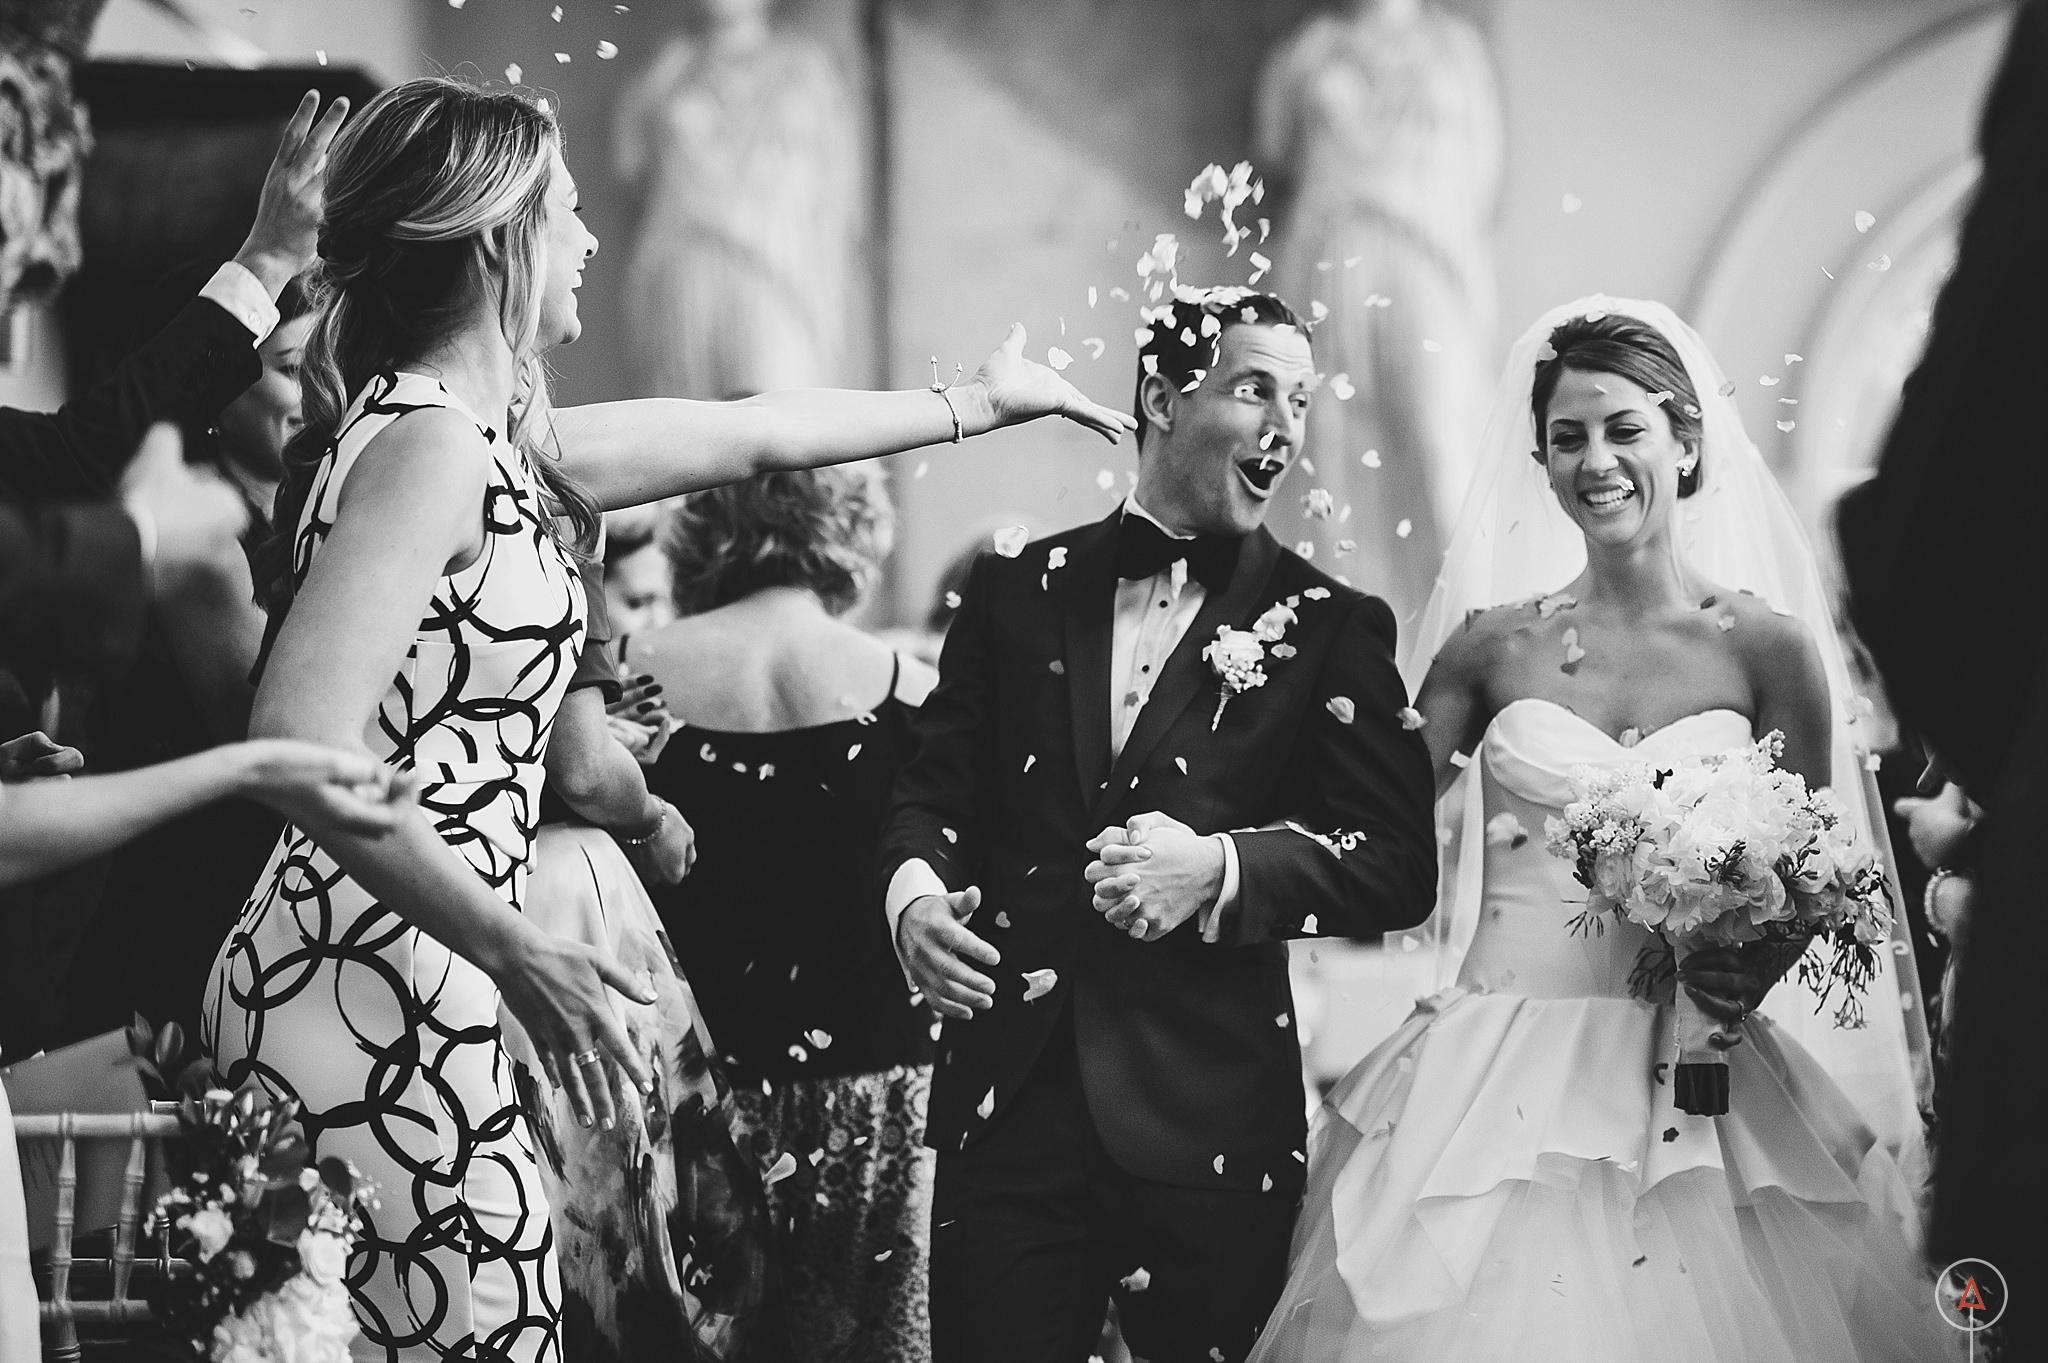 cardiff-wedding-photographer-aga-tomaszek_0257